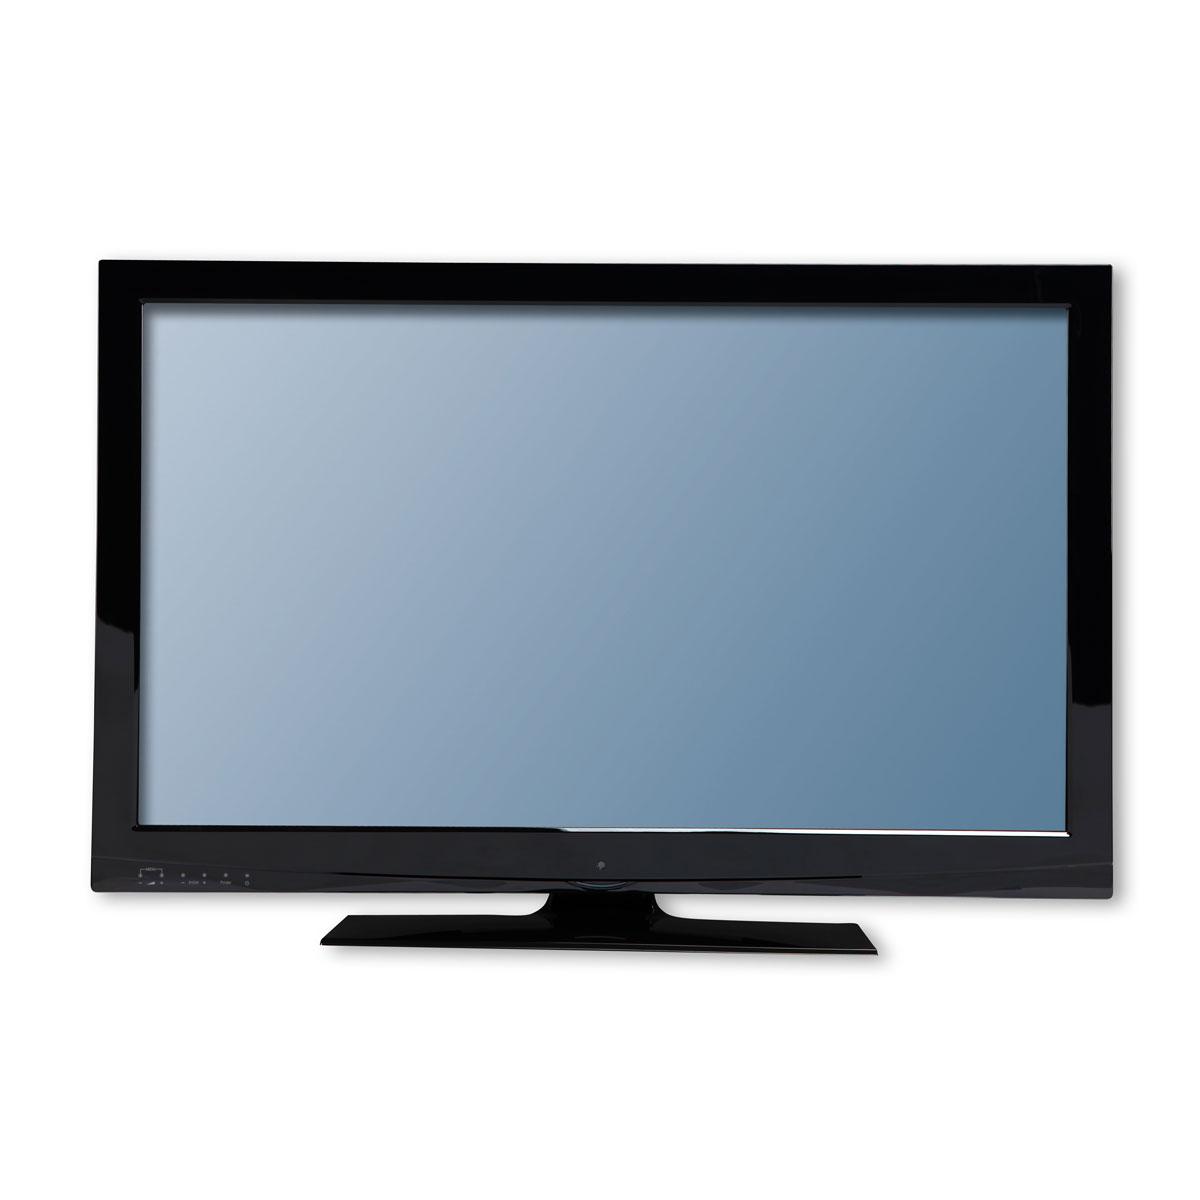 "TV Akios AKLC 32930 Téléviseur LCD 32"" (81 cm) 16/9 - 1366 x 768 pixels - Tuner TNT HD - HDTV"